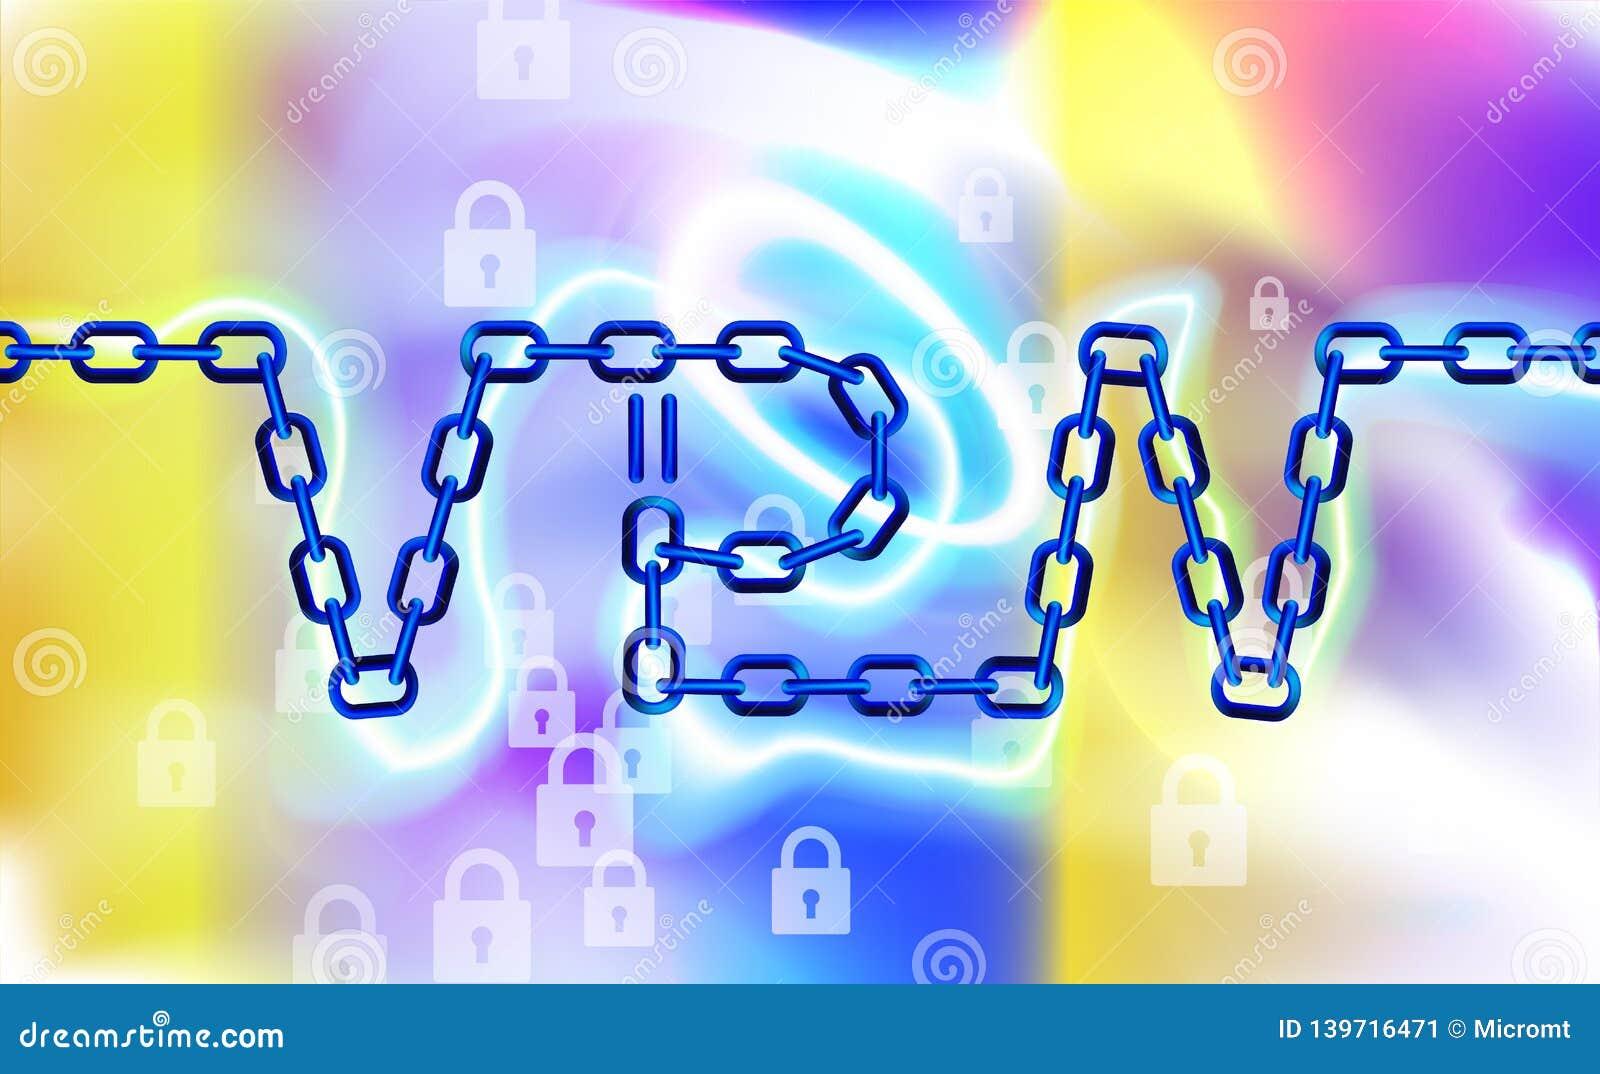 cryptocurrency mining eduroam vpn